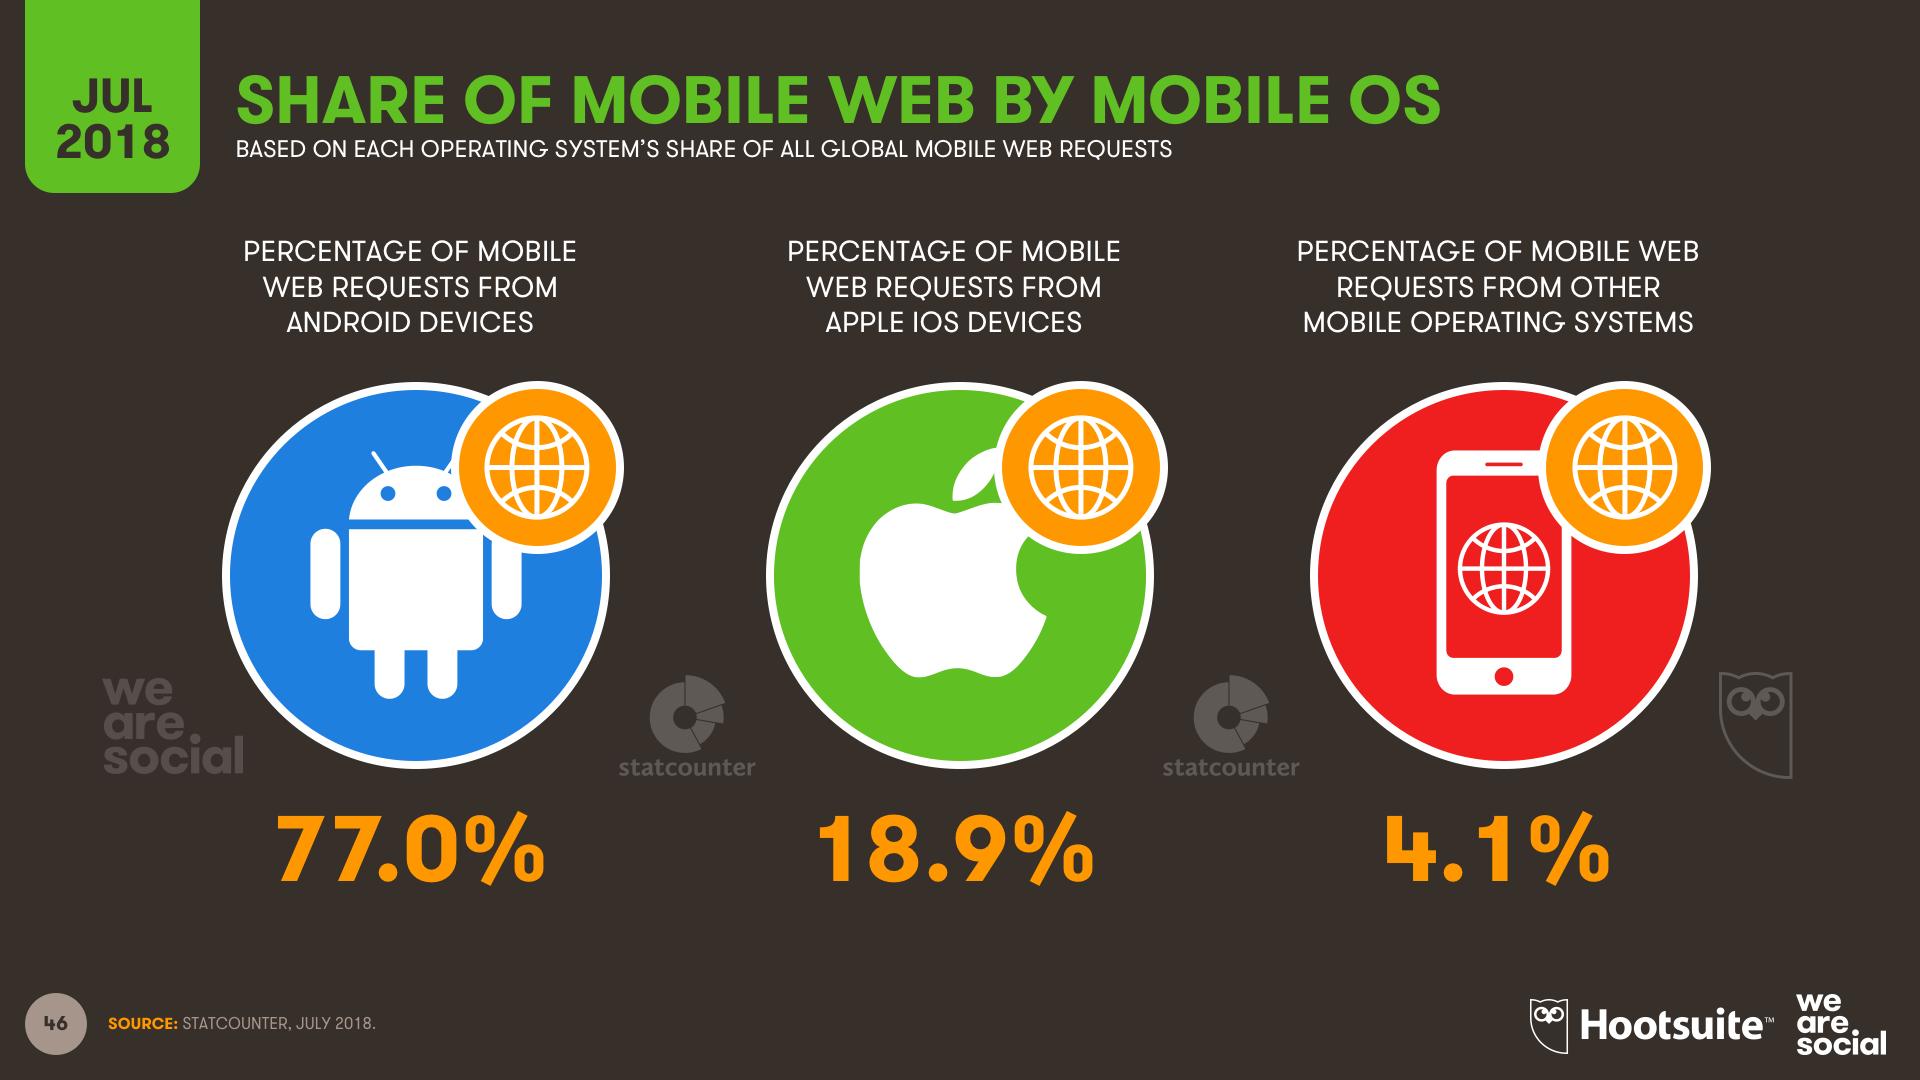 Q3 2018 - Mobile OS Share